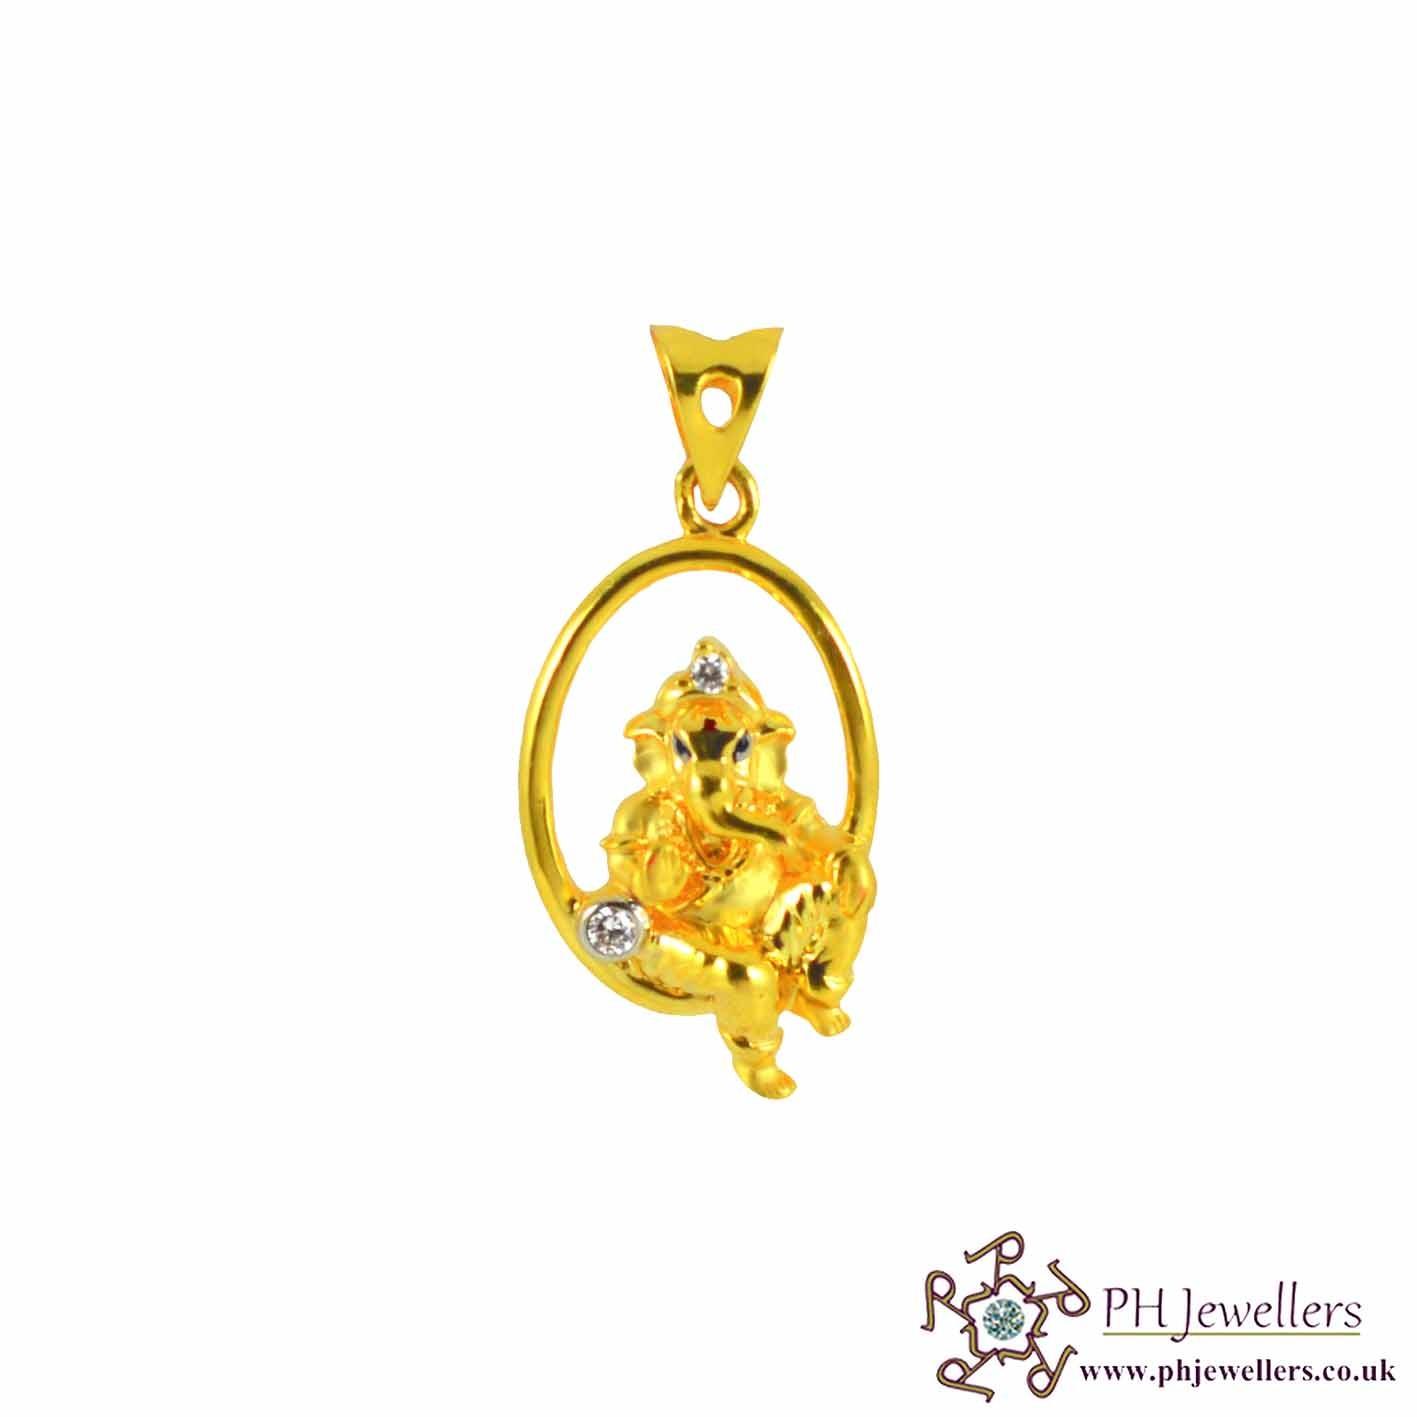 Gold jewellery religious 22ct 916 hallmark yellow gold ganesh gold jewellery religious 22ct 916 hallmark yellow gold ganesh pendant cz rp28 aloadofball Choice Image